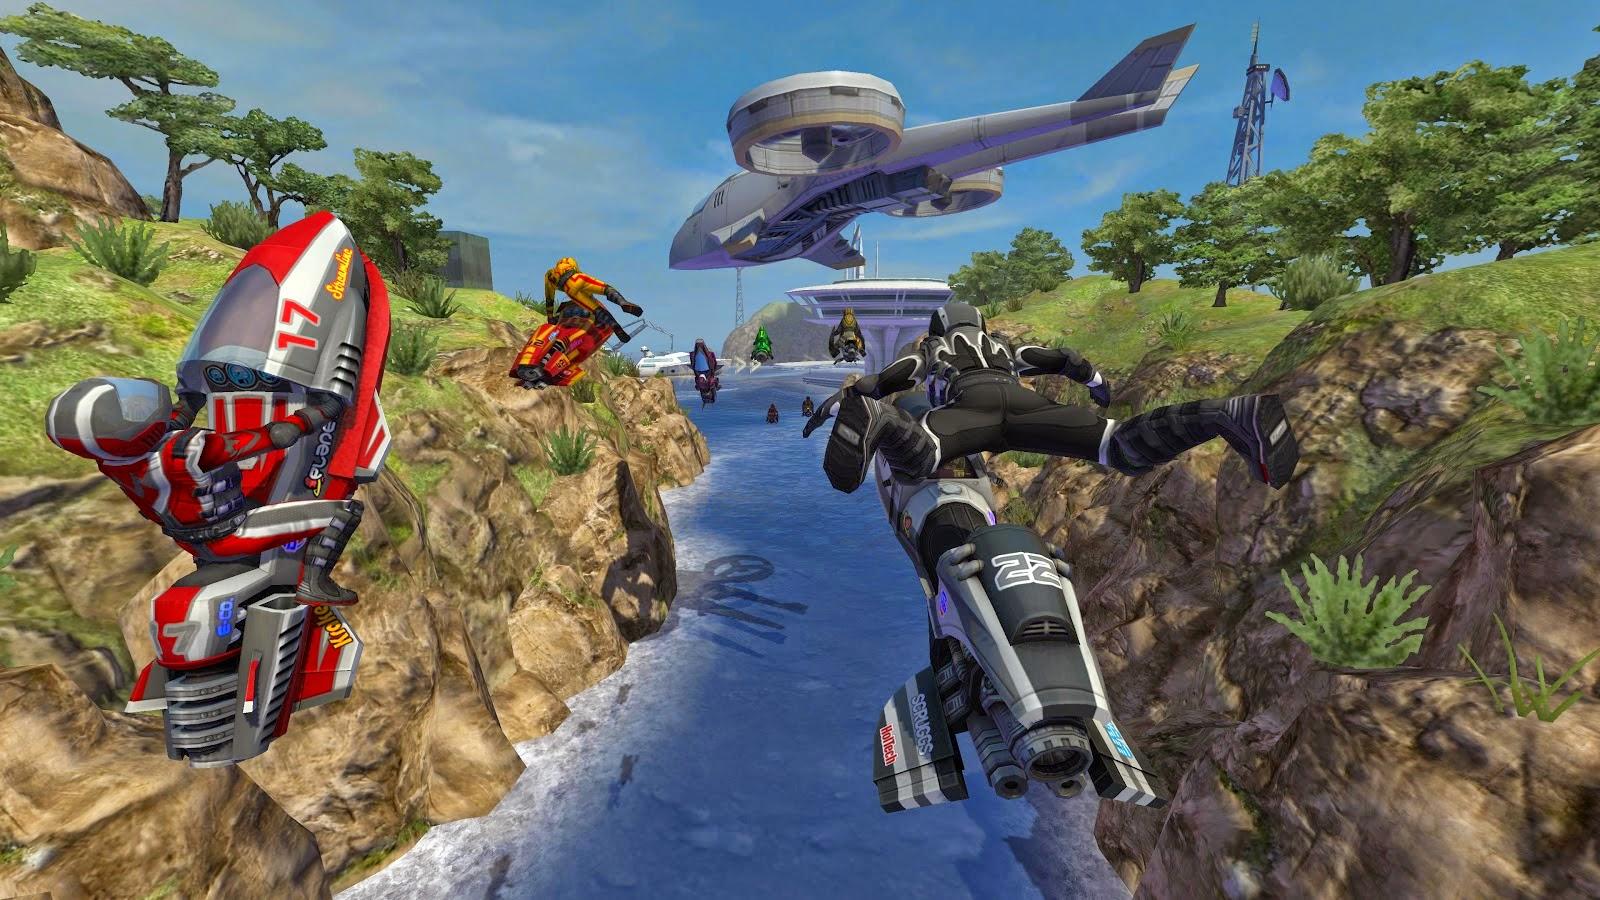 vRiptide GP2, Game Balapan Jet Air Seru